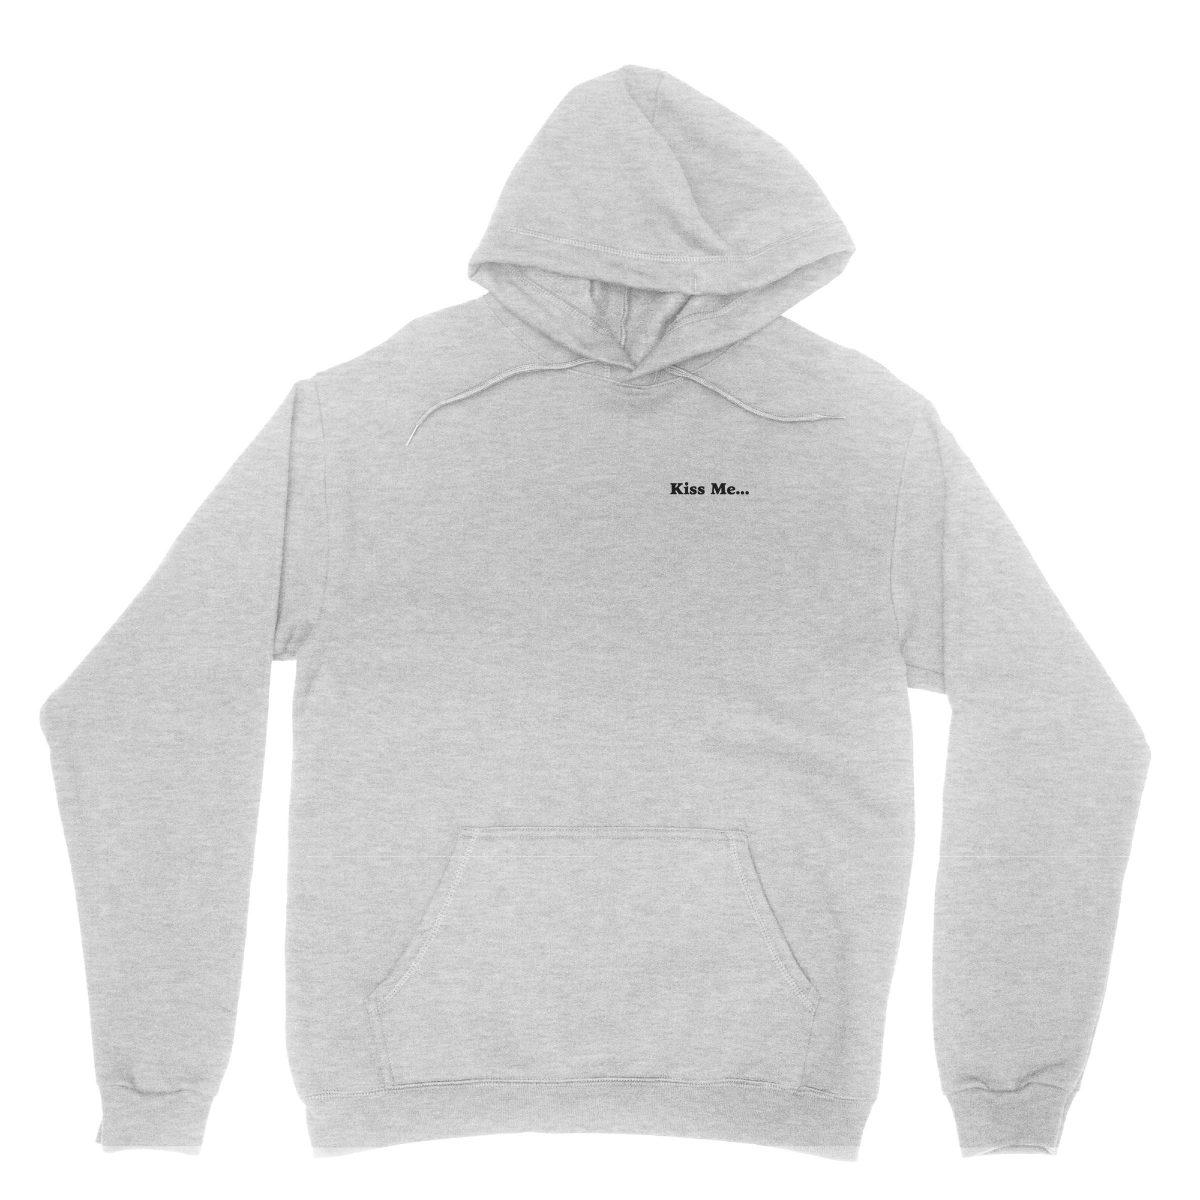 """kiss me between my legs"" hidden message hoodies in grey by kikicutt"